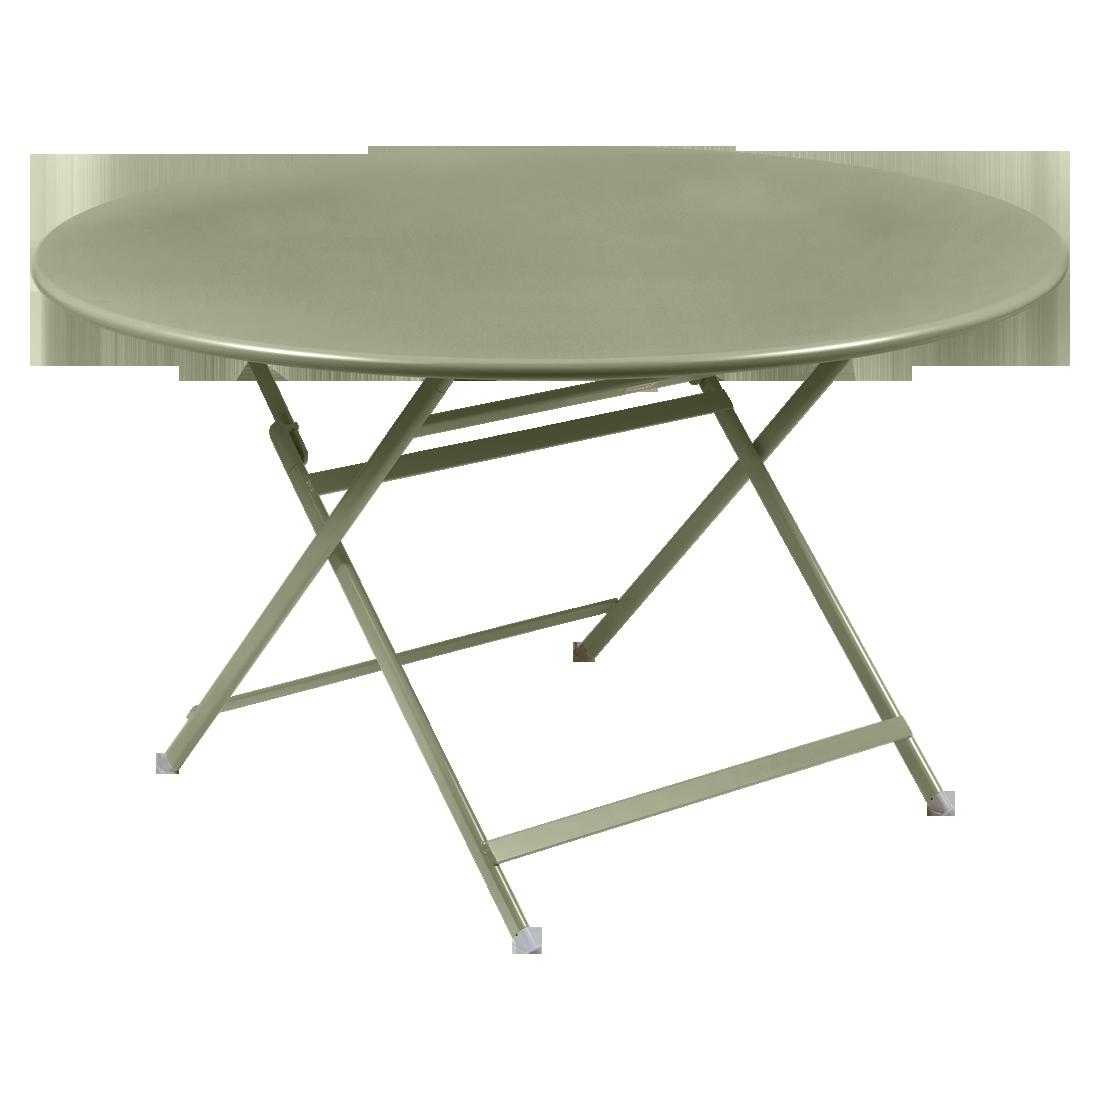 table de jardin pliante, table metal ronde, table metal 7 personnes, table de jardin verte, table metal verte